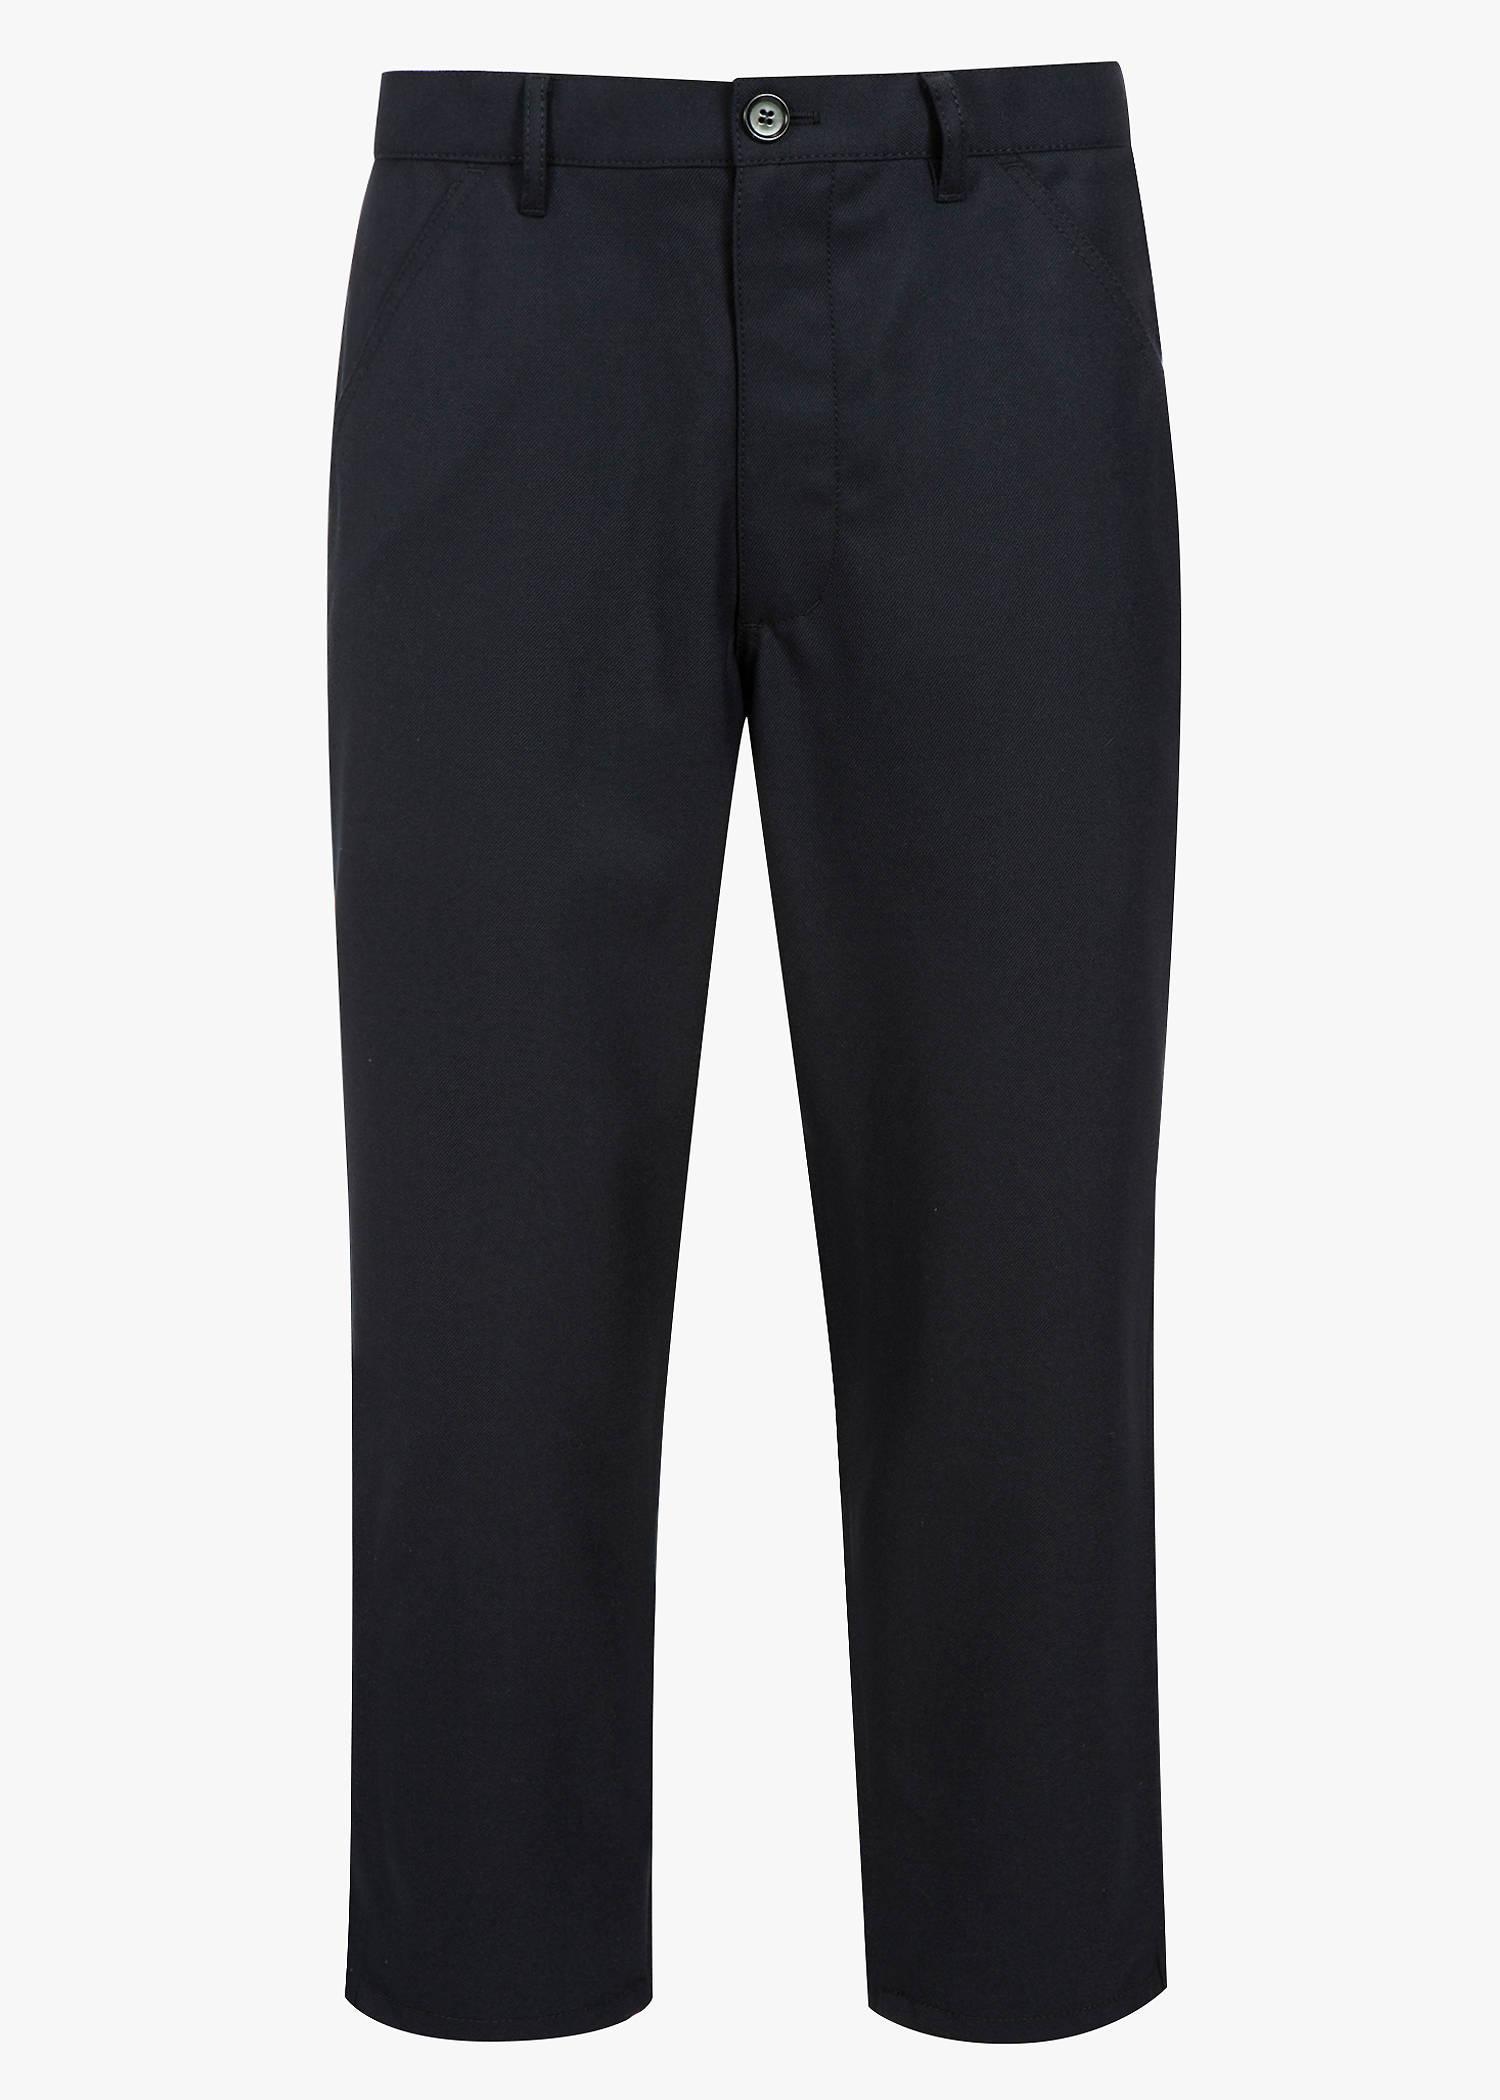 Comme Des GarÇOns Shirt Cropped Pants In Navy